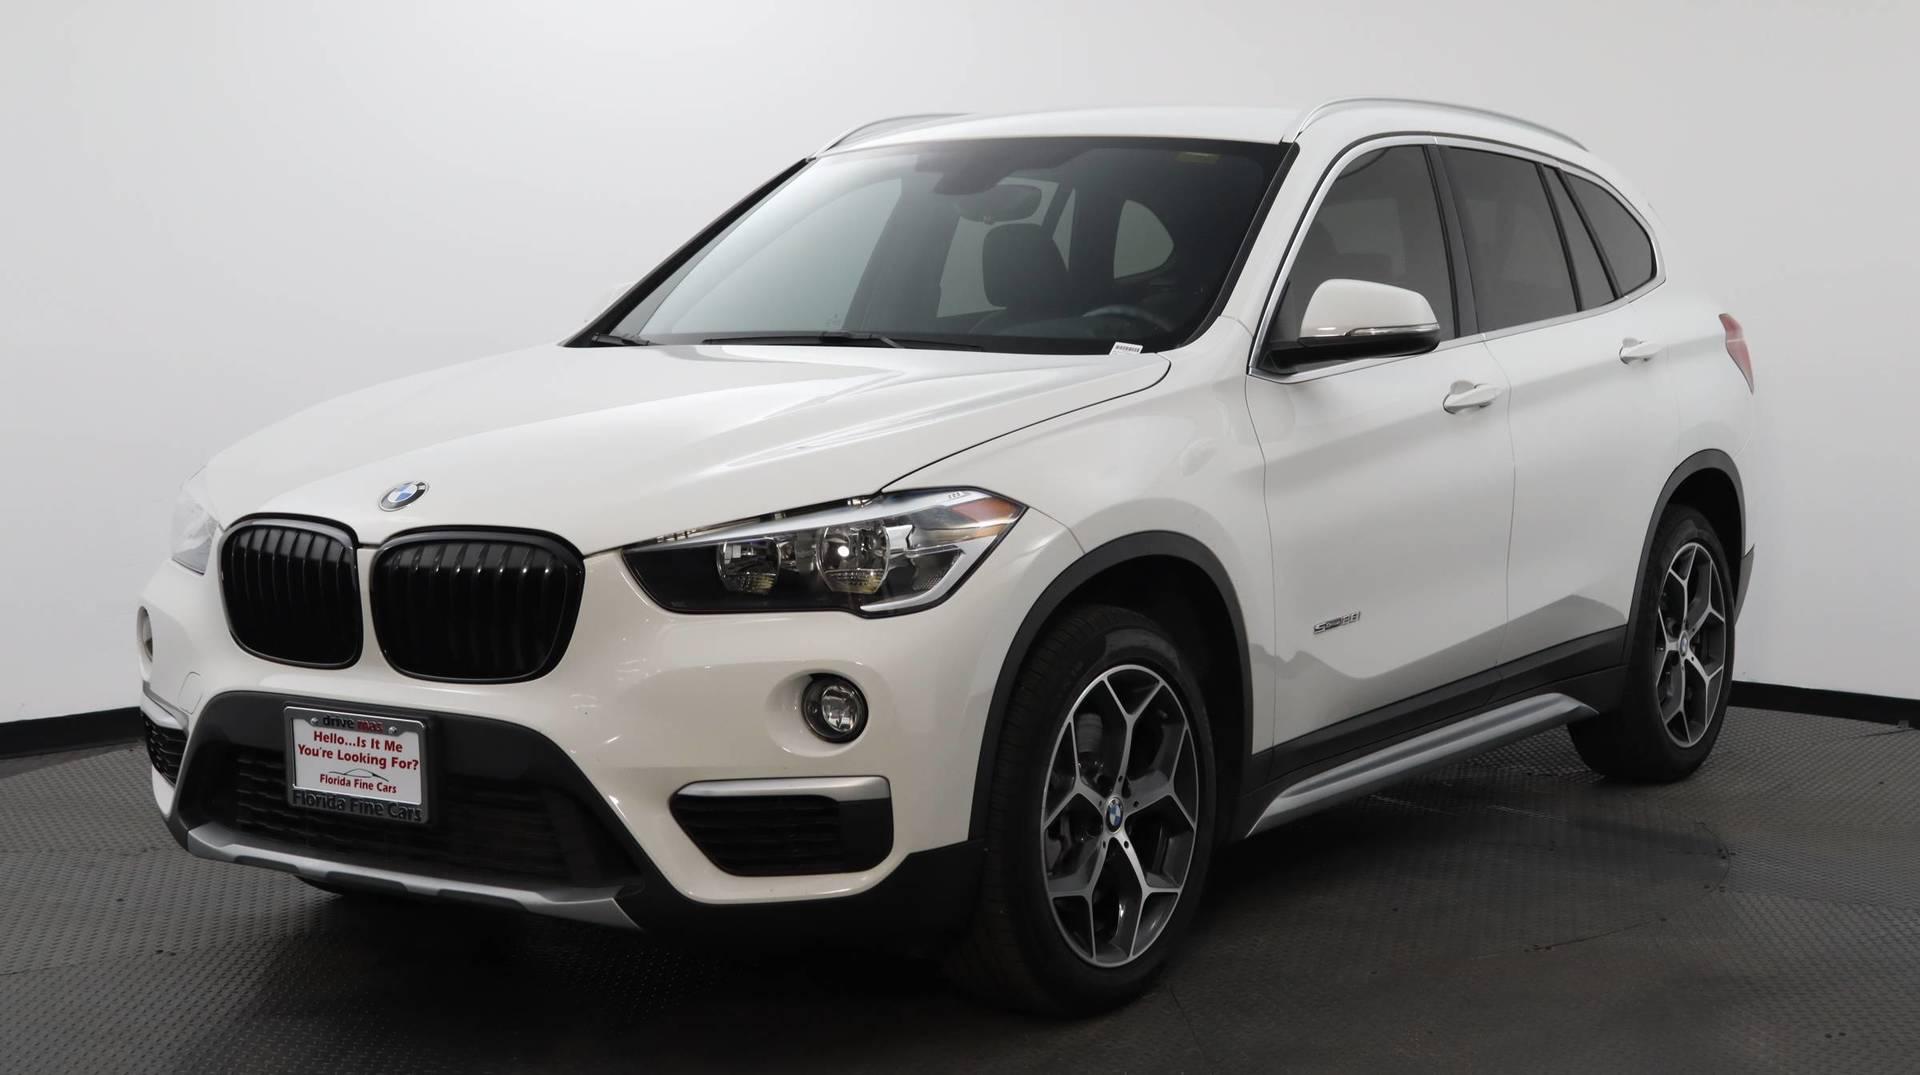 Florida Fine Cars - Used vehicle - SUV BMW X1 2018